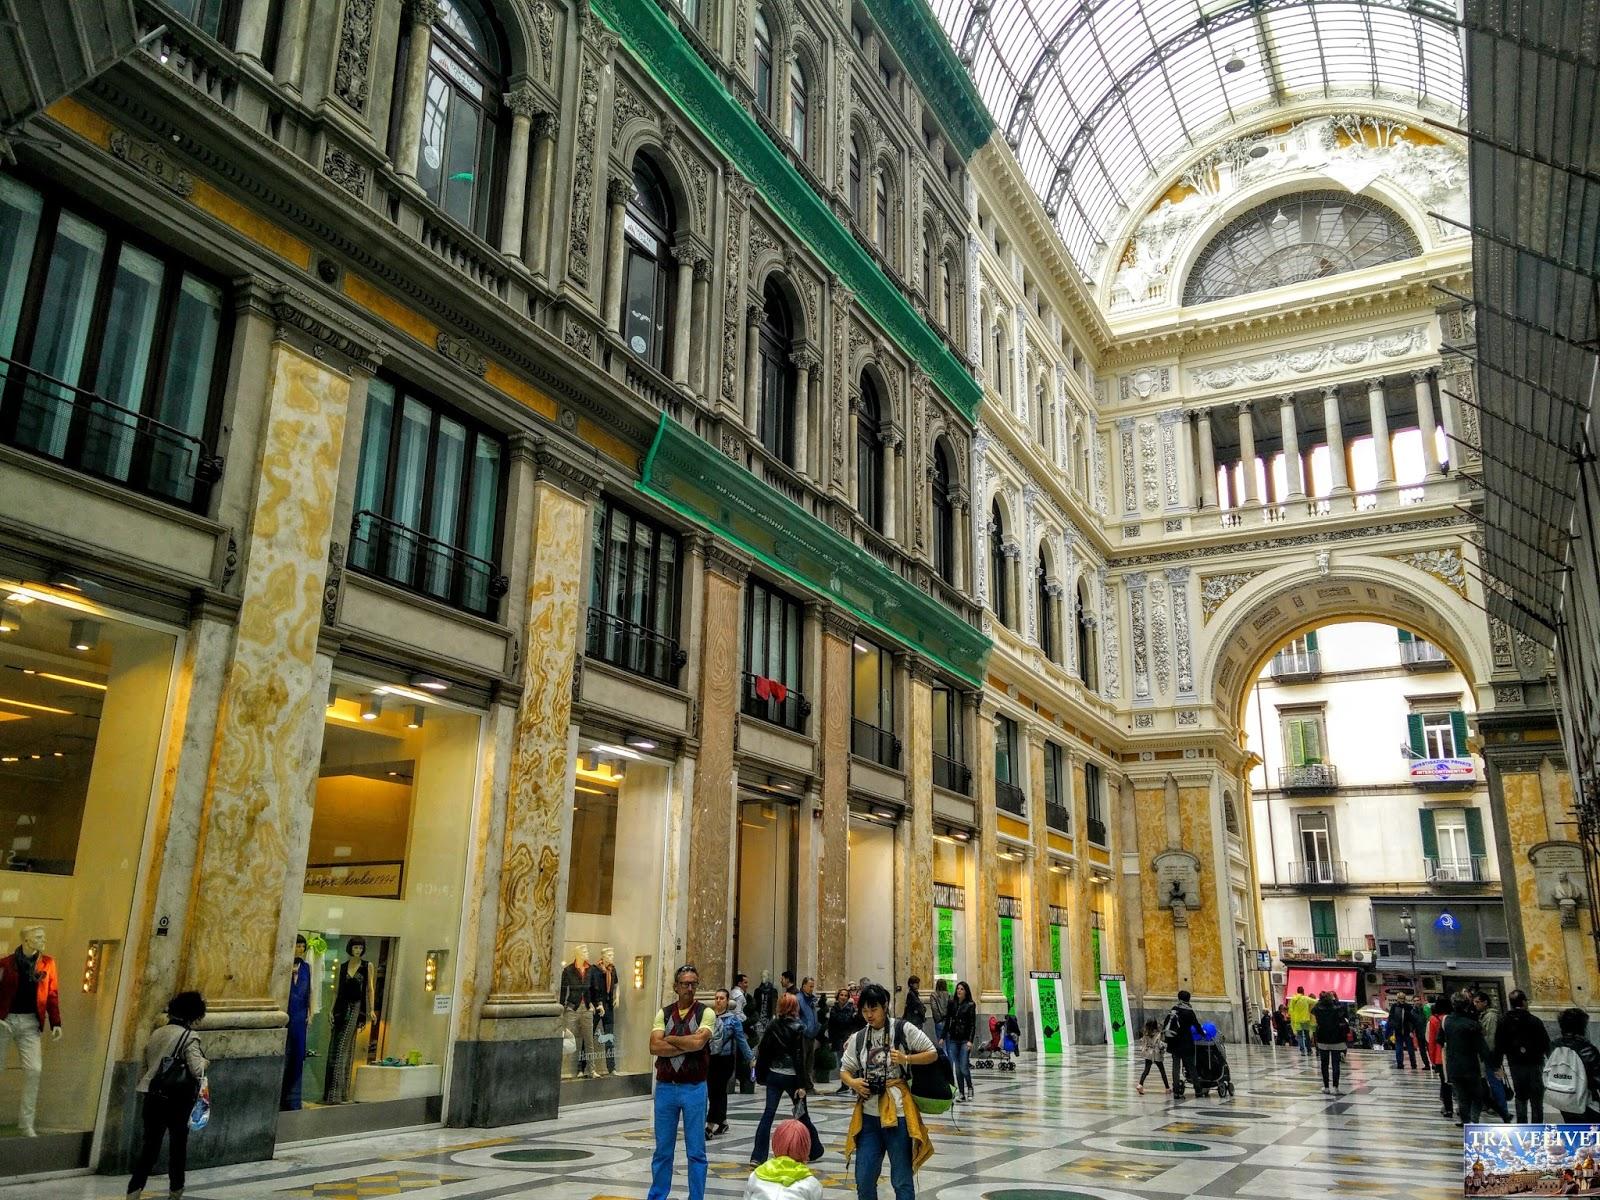 Italie Naples Napoli Galleria Umberto I